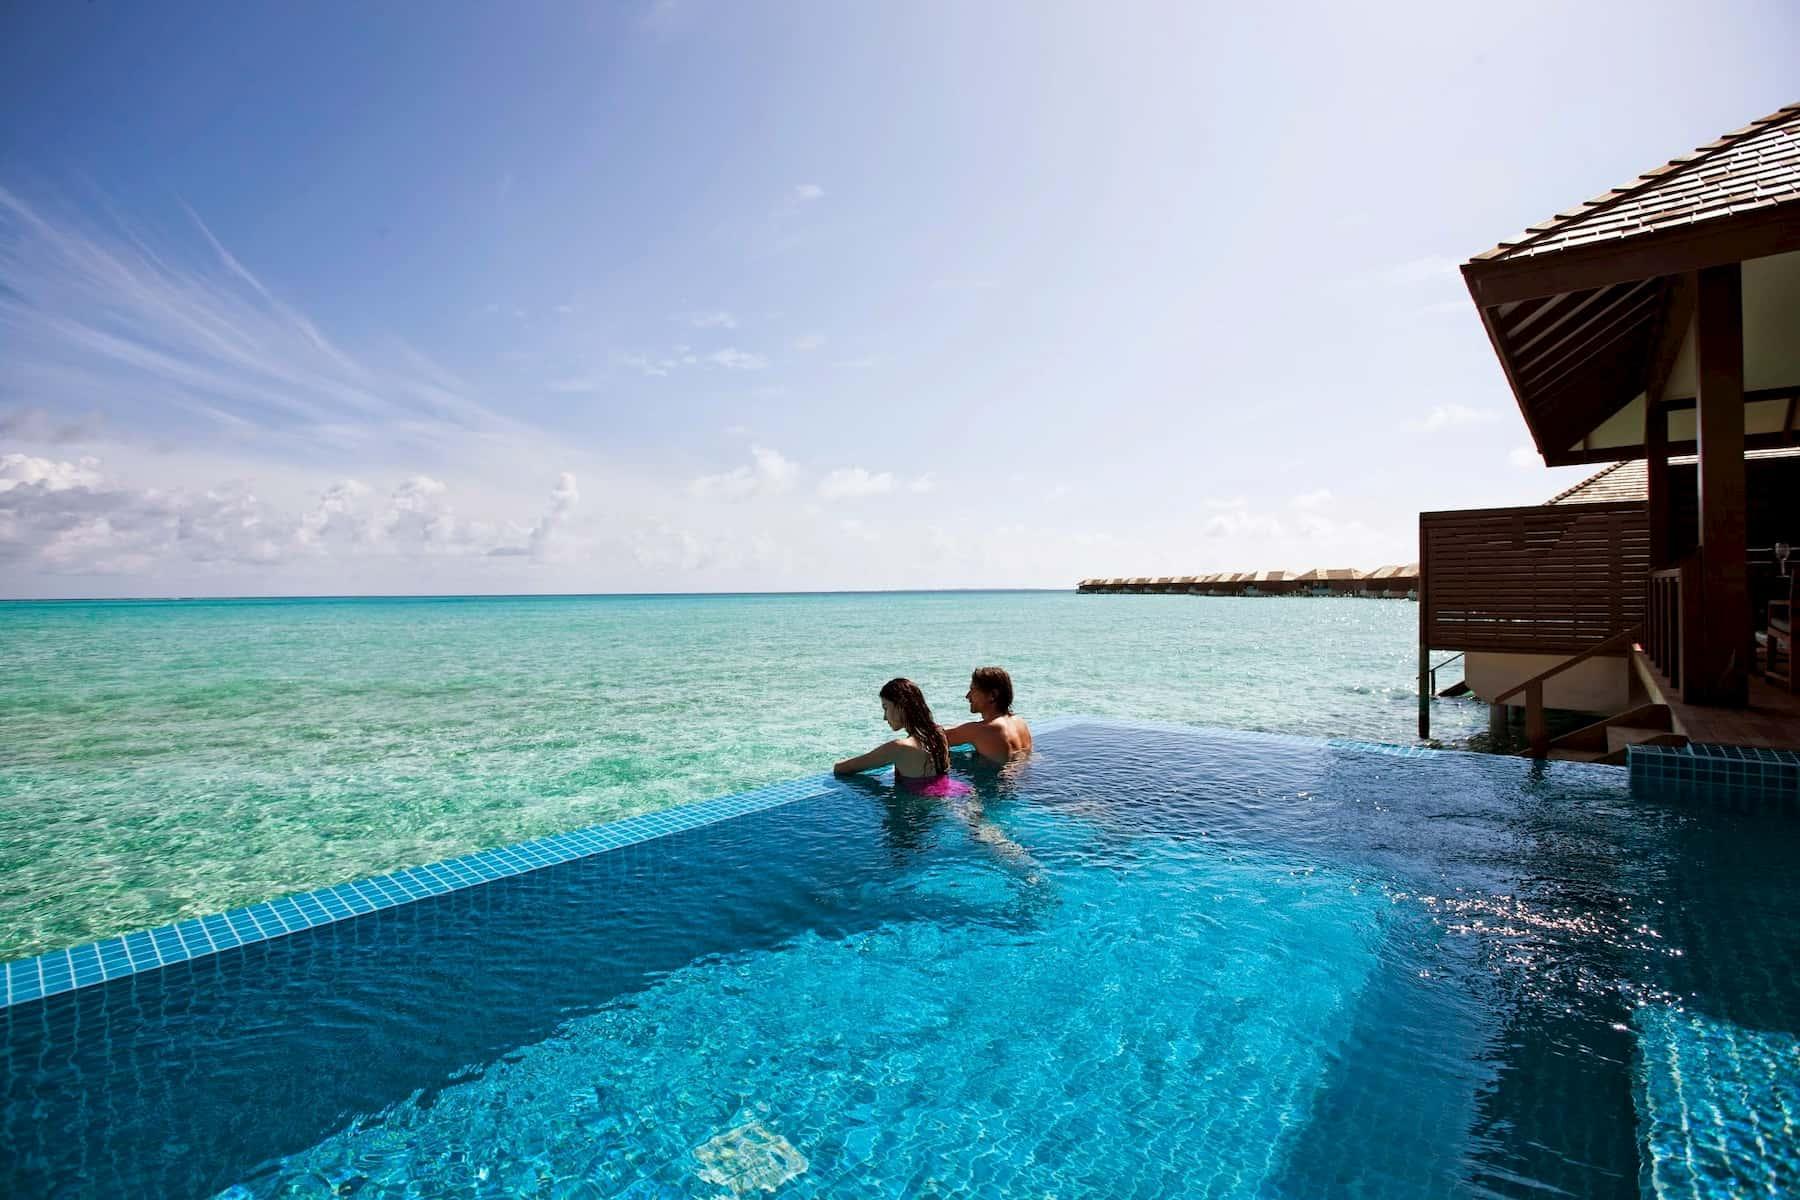 Resort Maldive Beach Resort & Spa deluxe water villa with pool